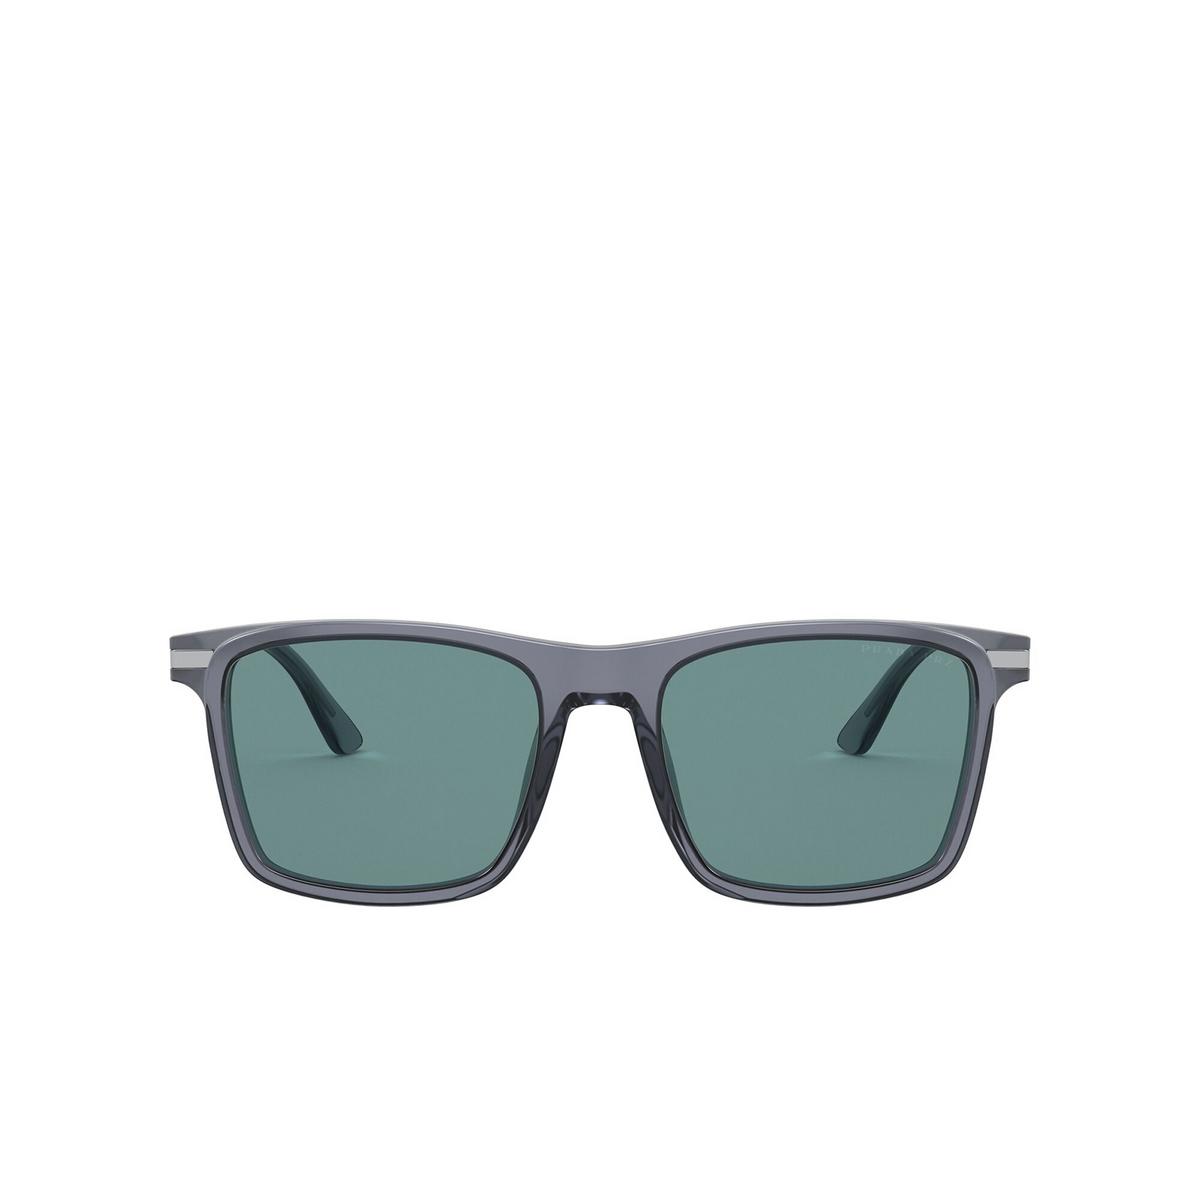 Prada® Square Sunglasses: PR 19XS color Grey 01G04D - front view.